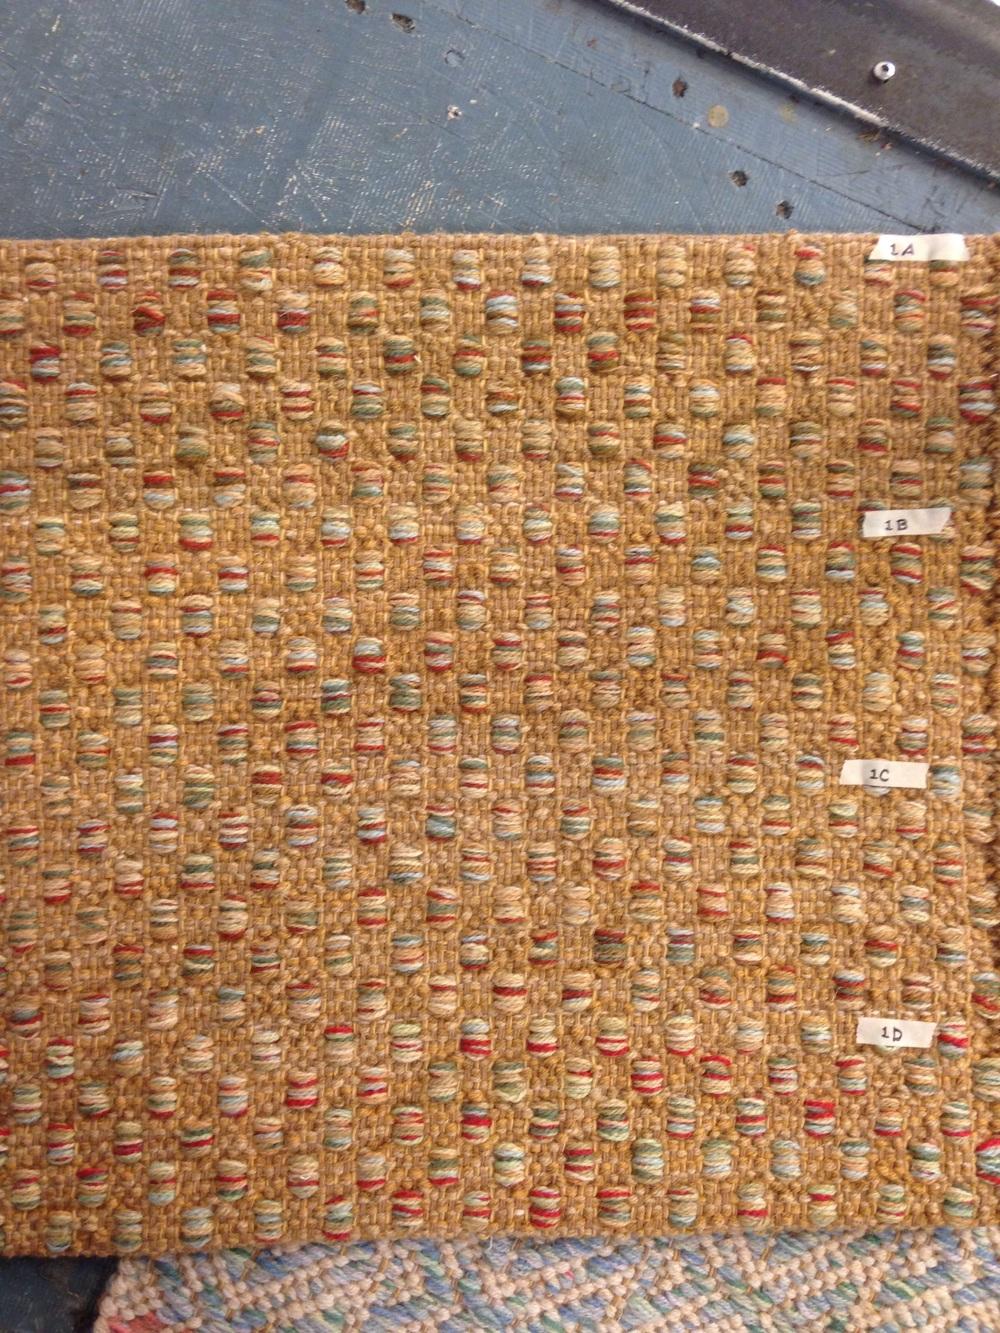 Mosaic handwoven rug